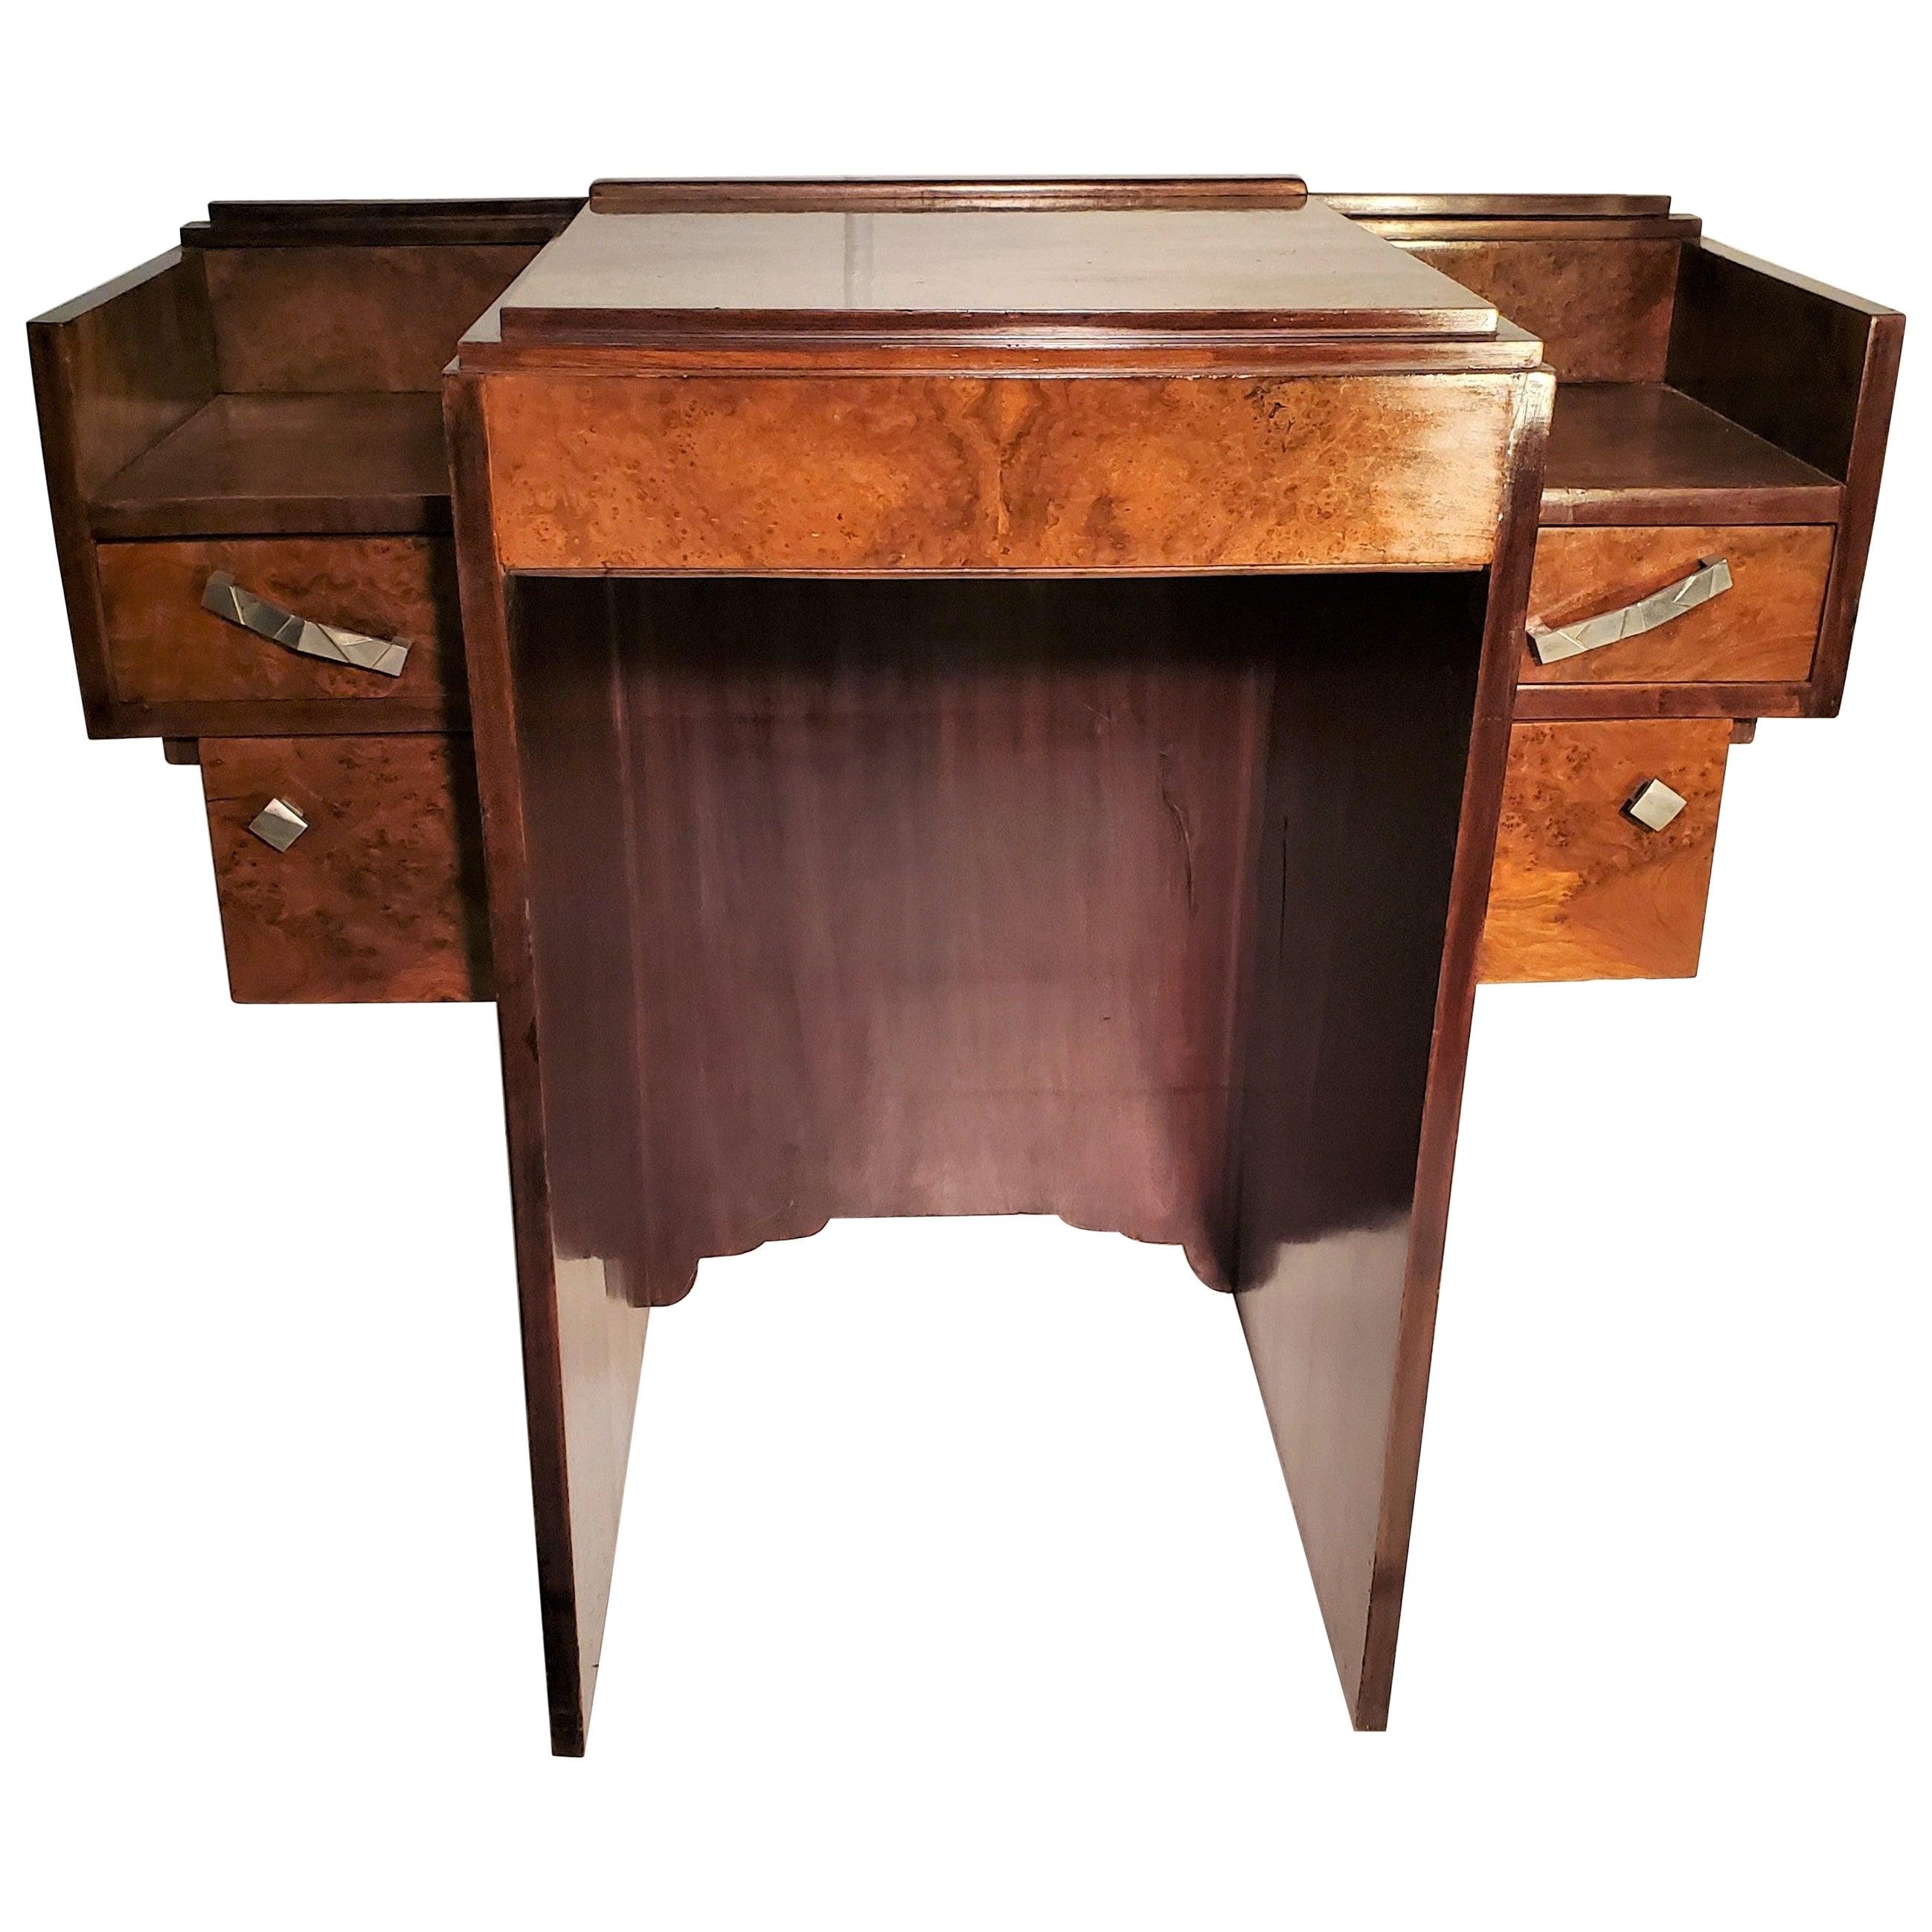 Small French Art Deco Writing Desk/ vanity